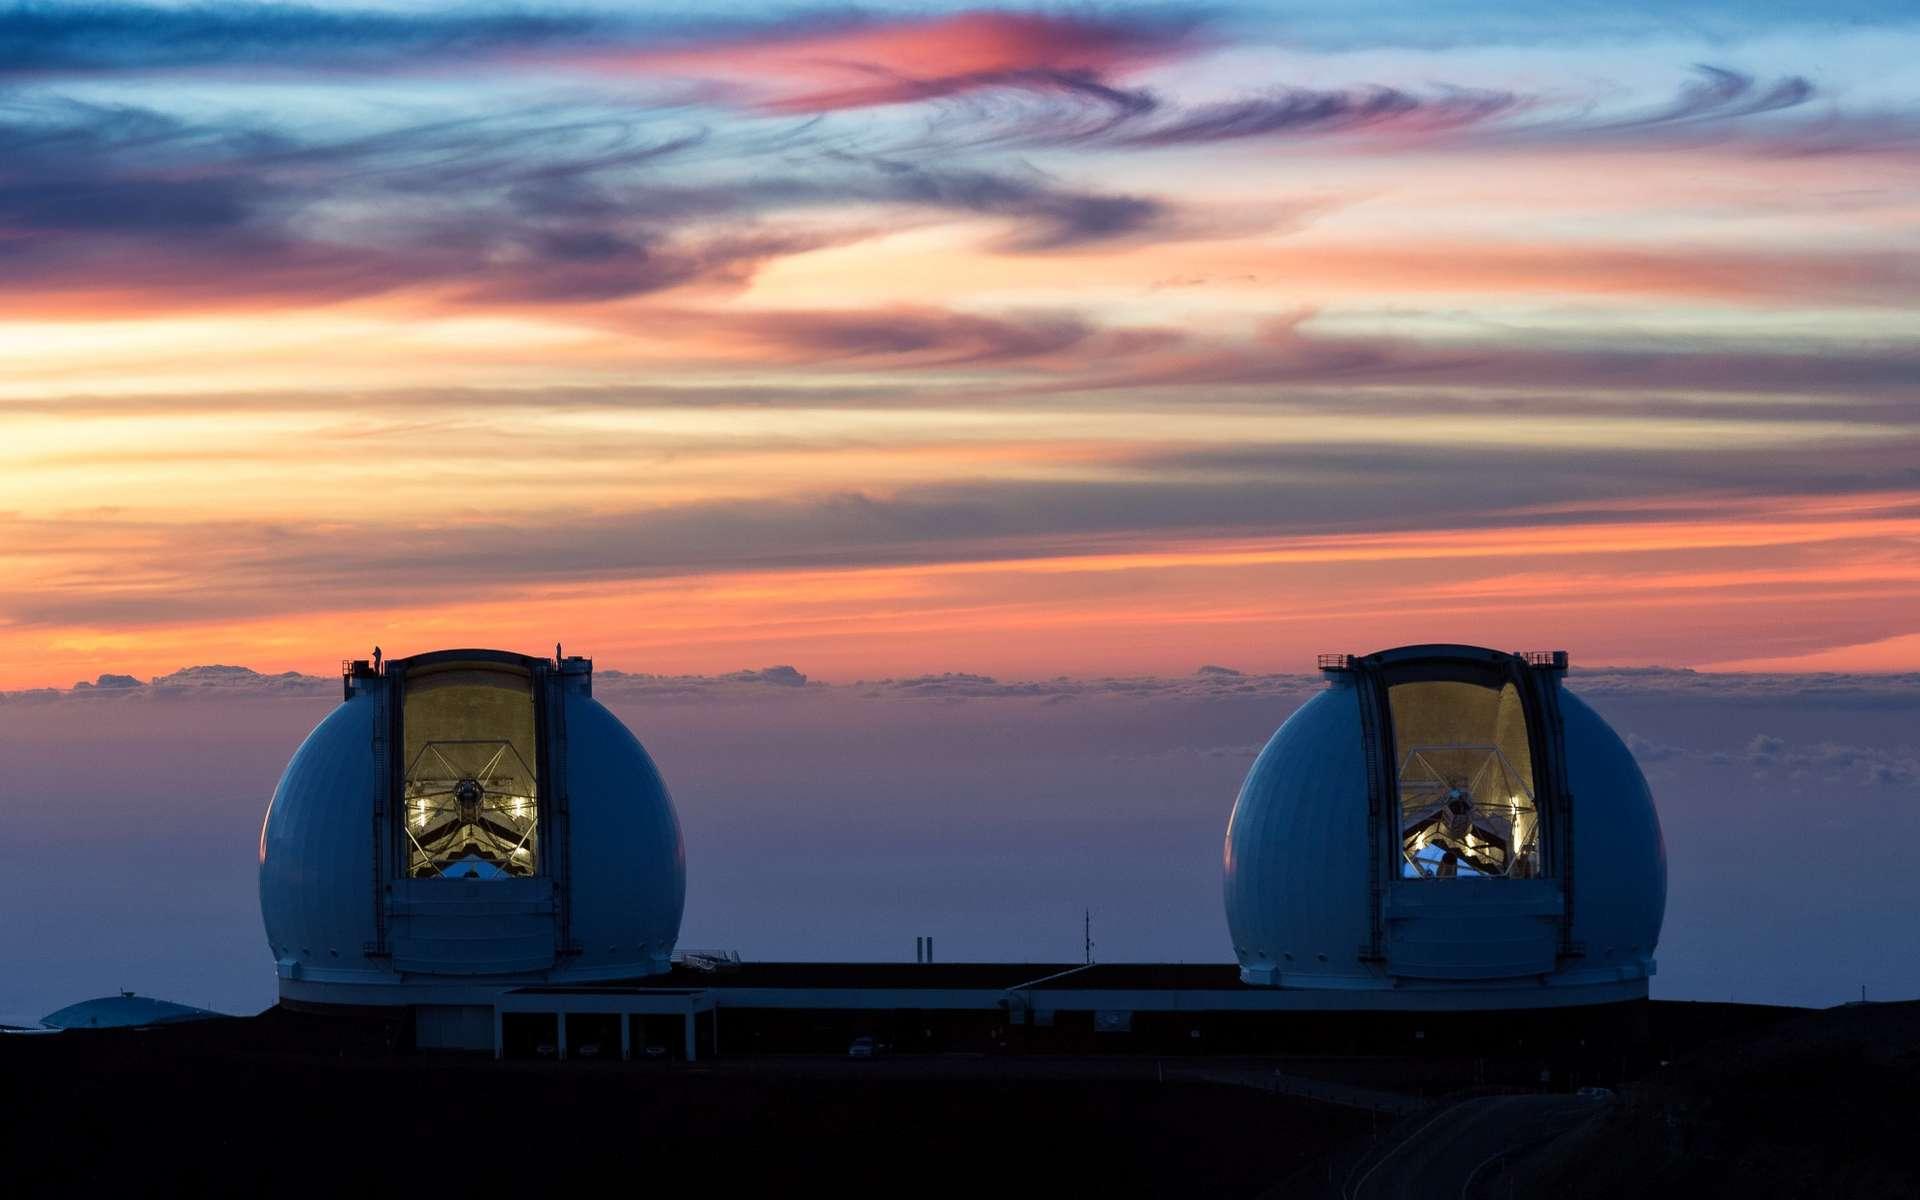 Vue du W.M. Keck Observatory au sommet du Mauna Kea à Hawaï. © 2021 W. M. Keck Observatory